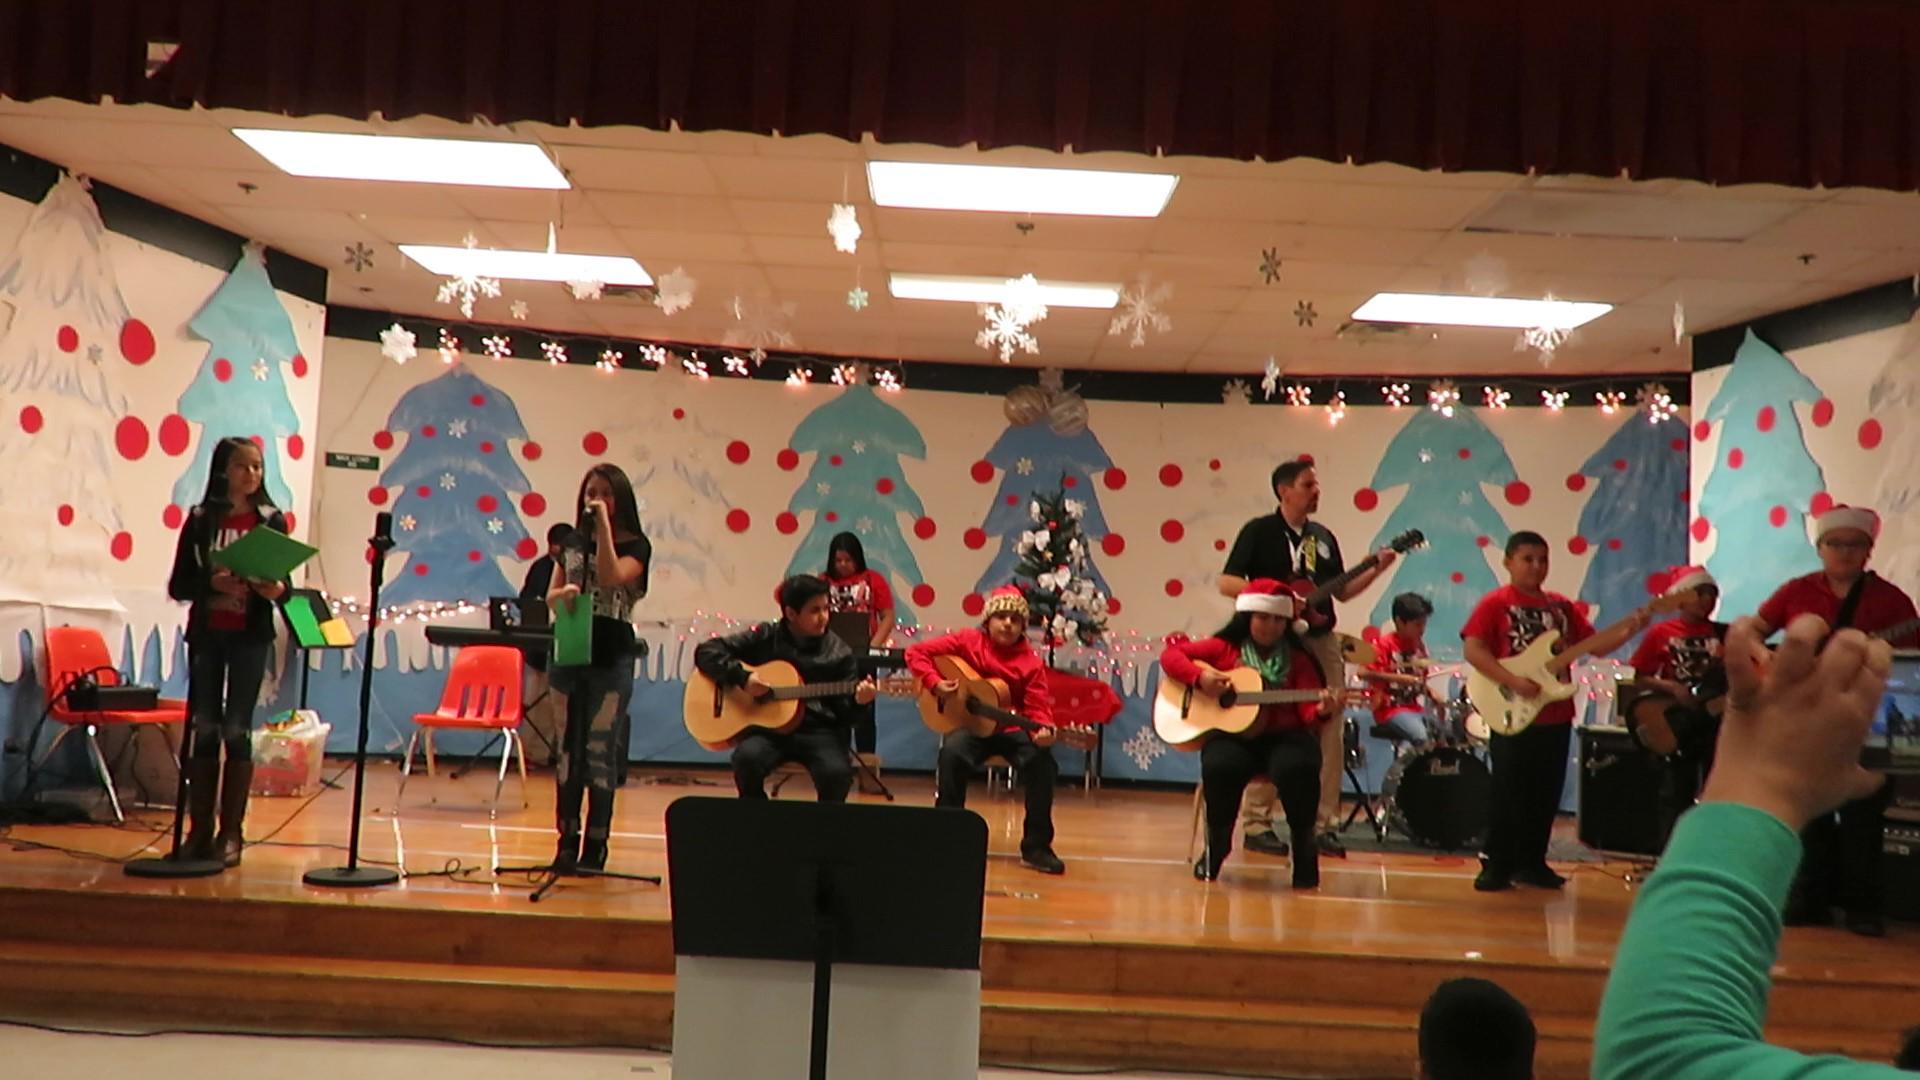 frederick douglass elementary school frederick douglass elementary school - Frederick Christmas Show